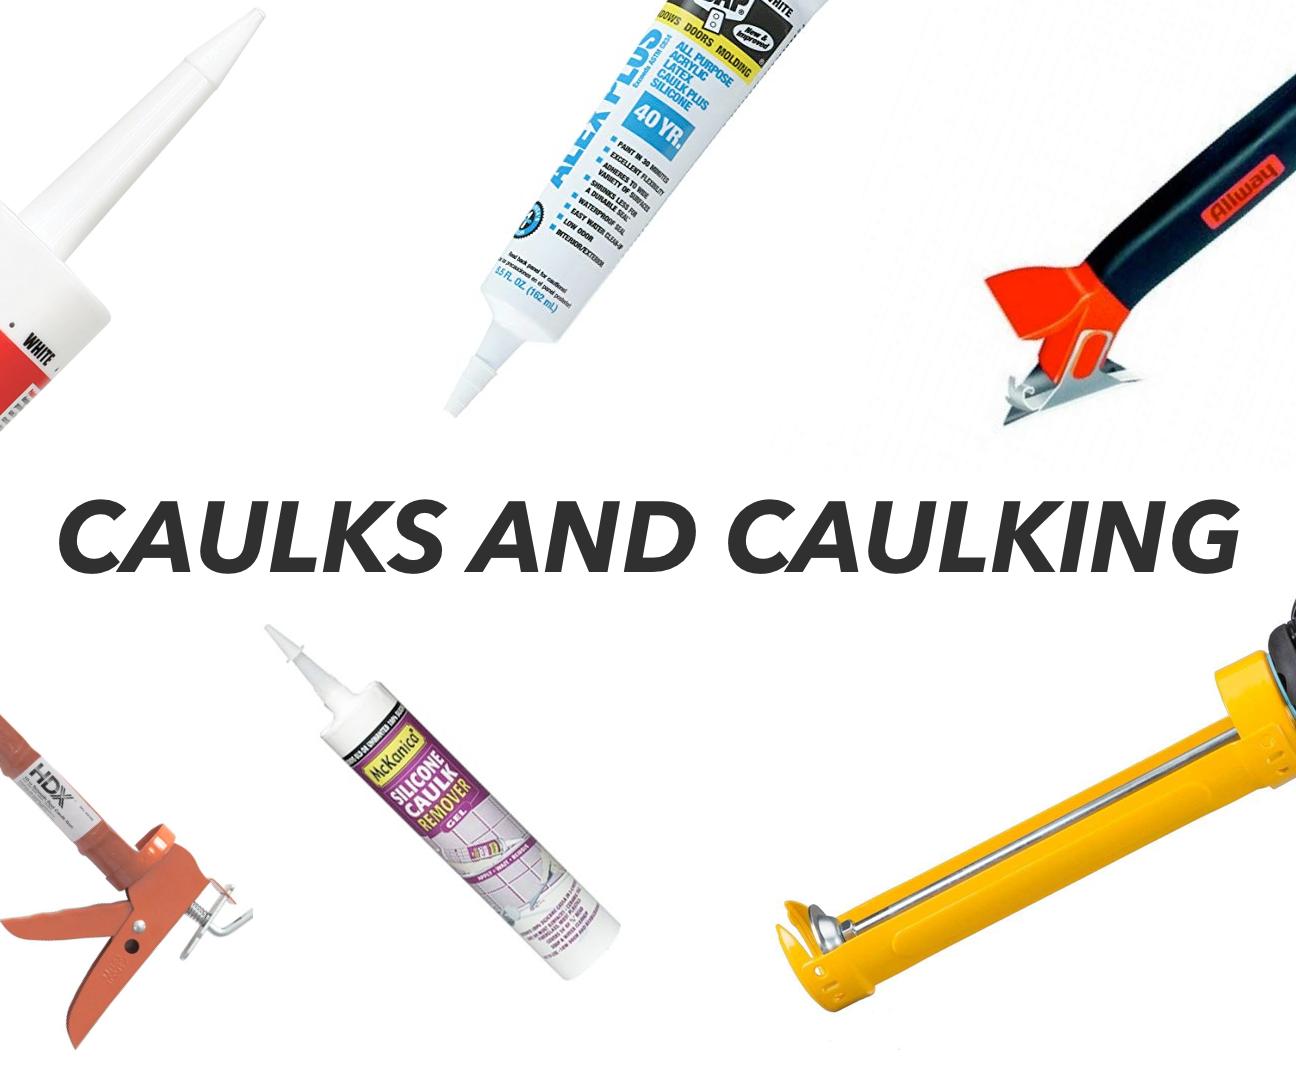 All About Caulk and Caulking